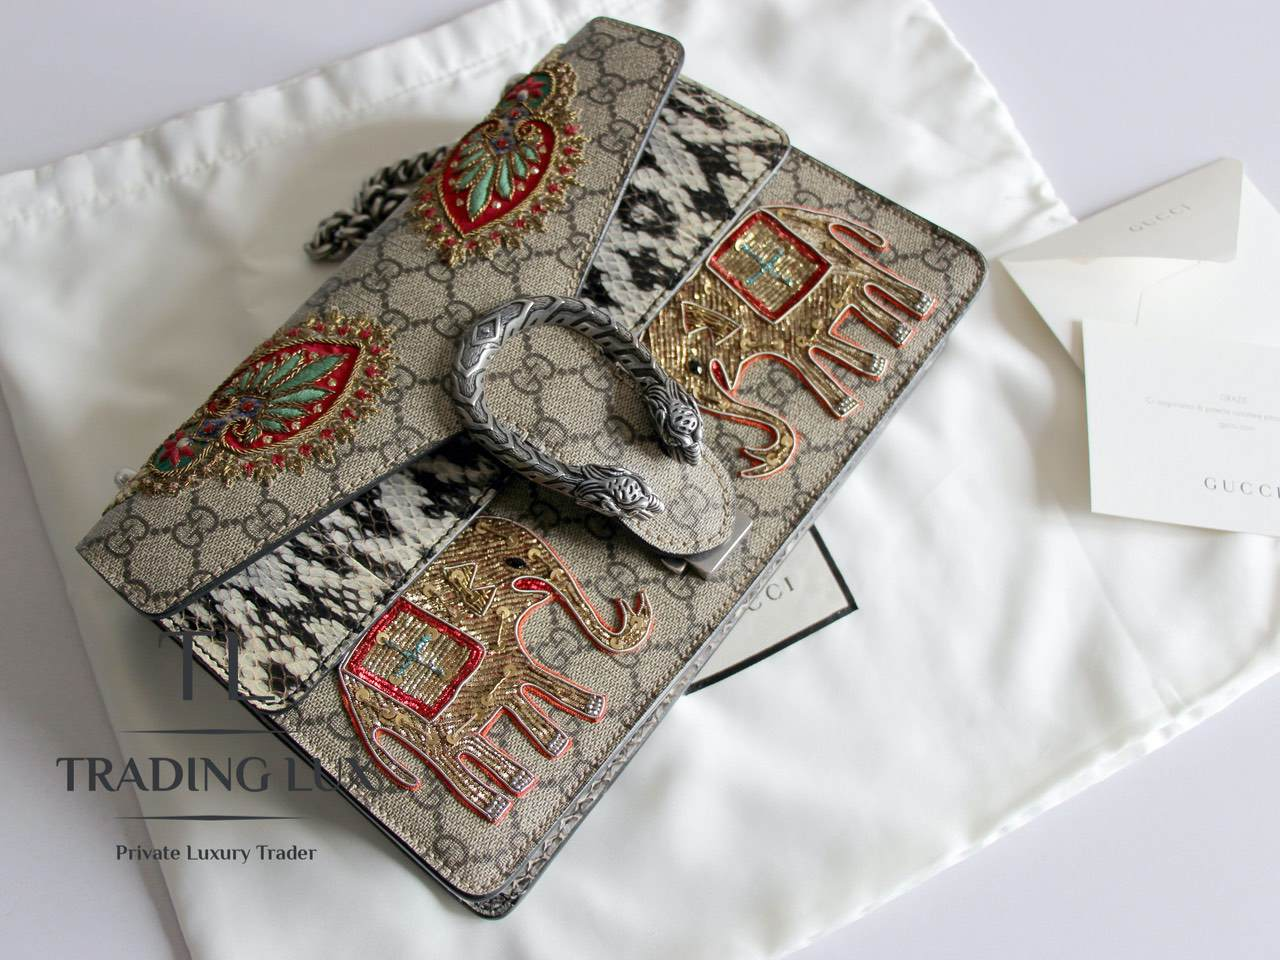 Gucci-GG-Supreme-Canvas-Dionysus-8